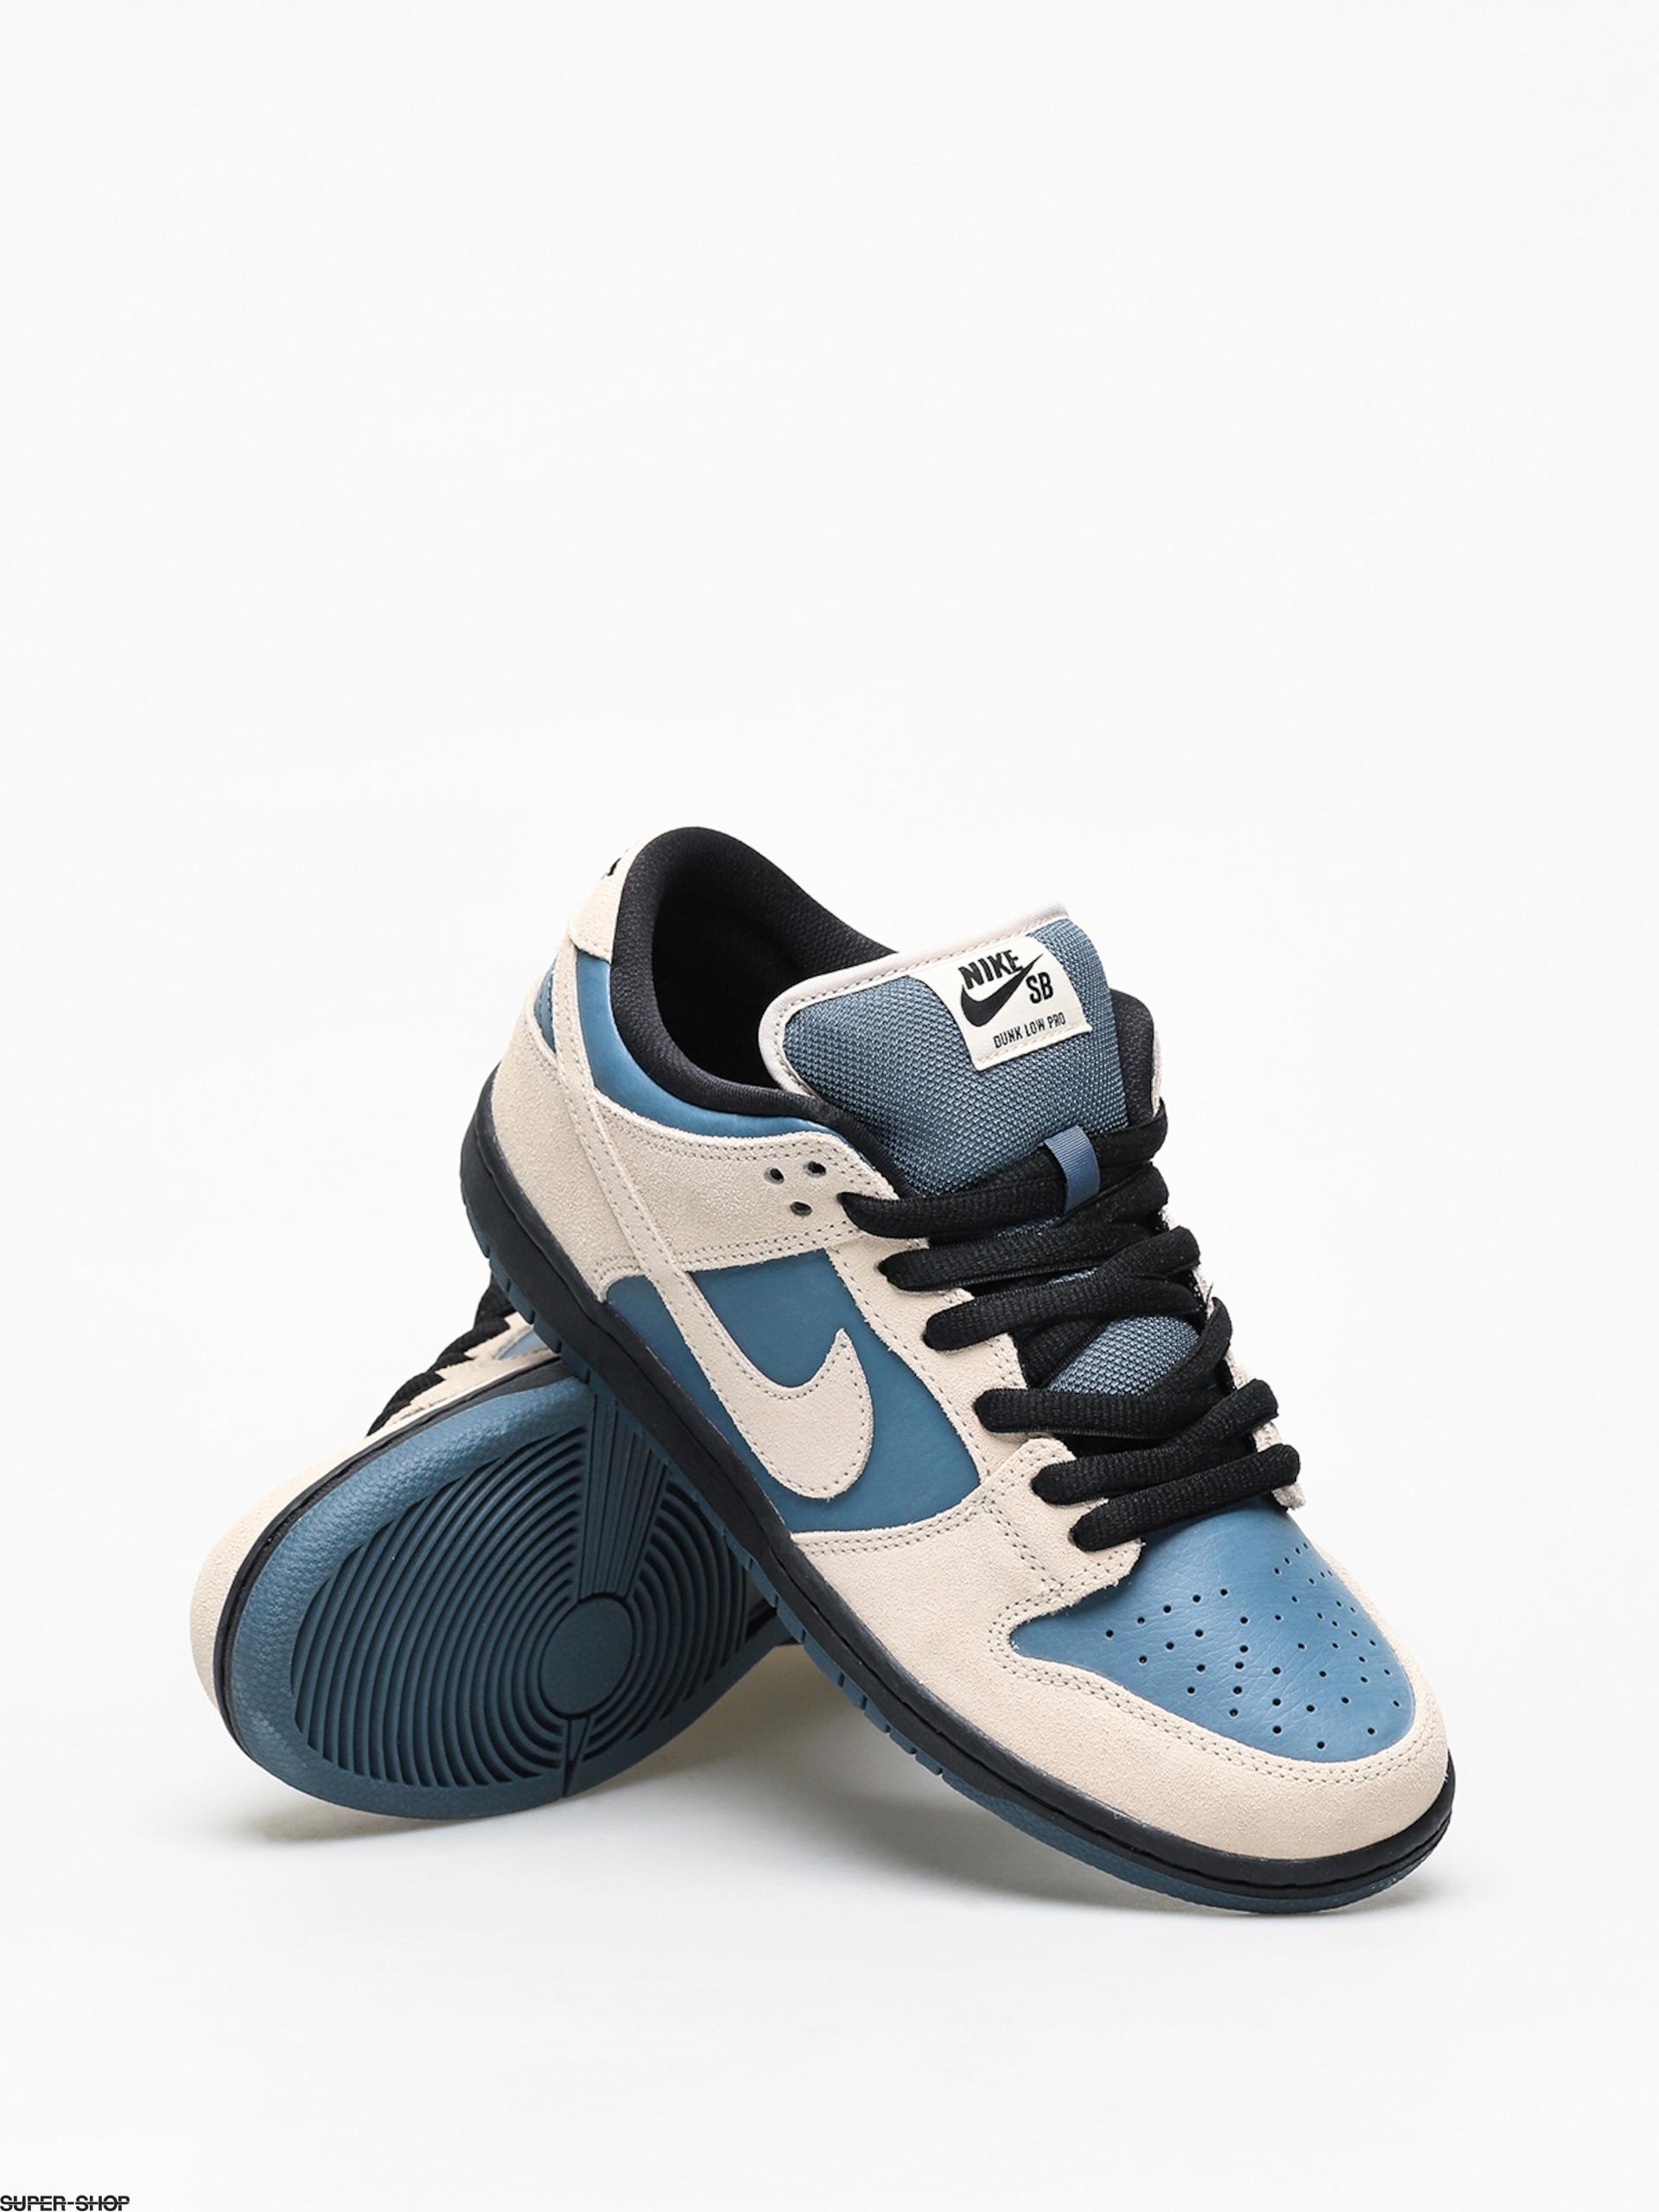 efb4d8d84b Nike SB Dunk Low Pro Shoes (light cream light cream thunderstorm)